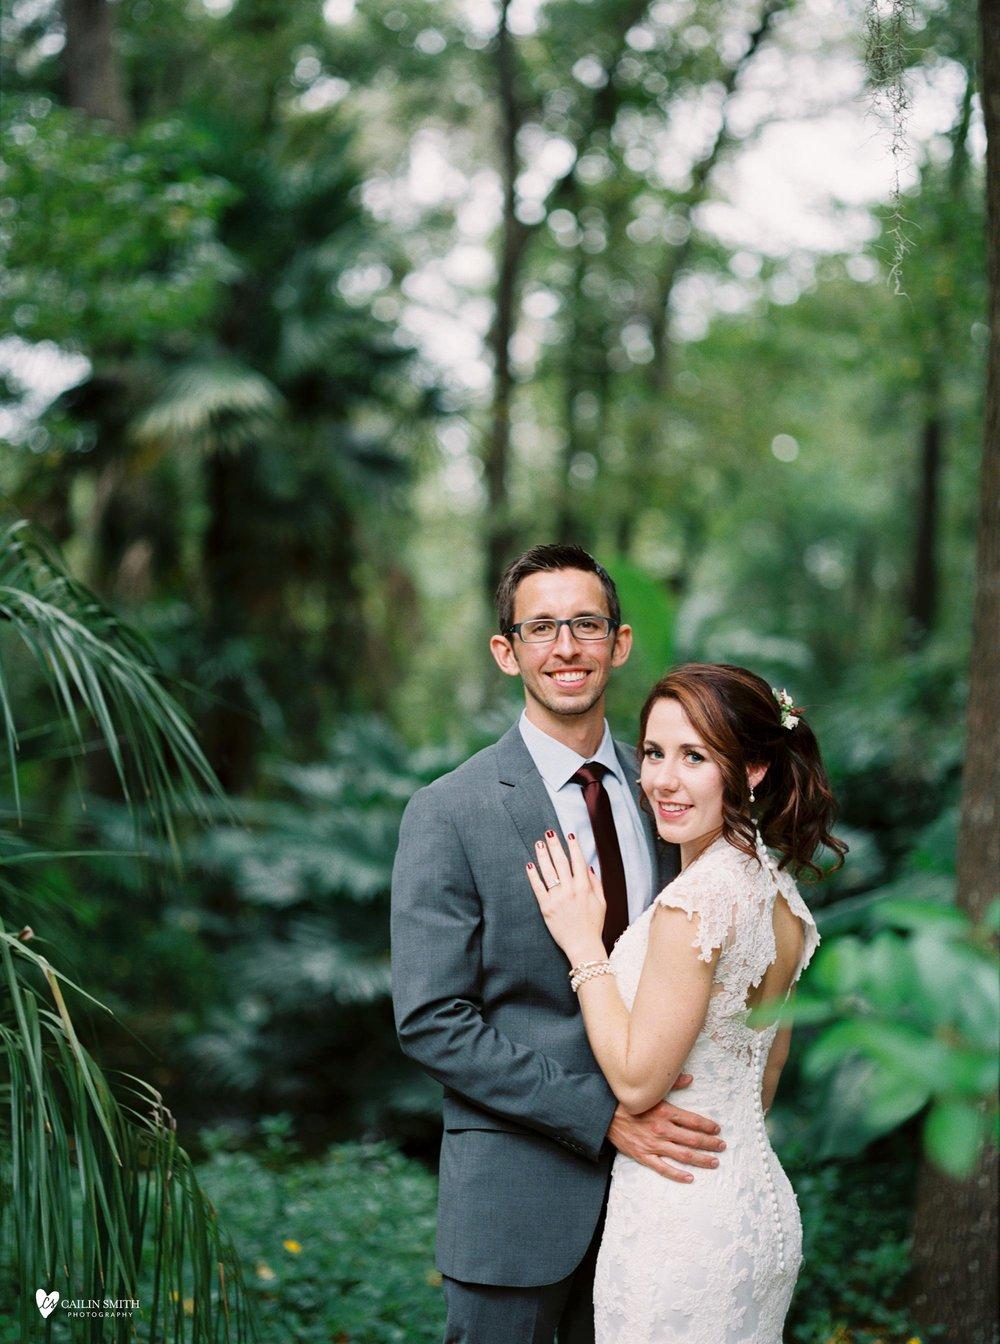 Shelby_Jeff_Ponte_Vedra_Hilltop_Club_Wedding_Photography_050.jpg